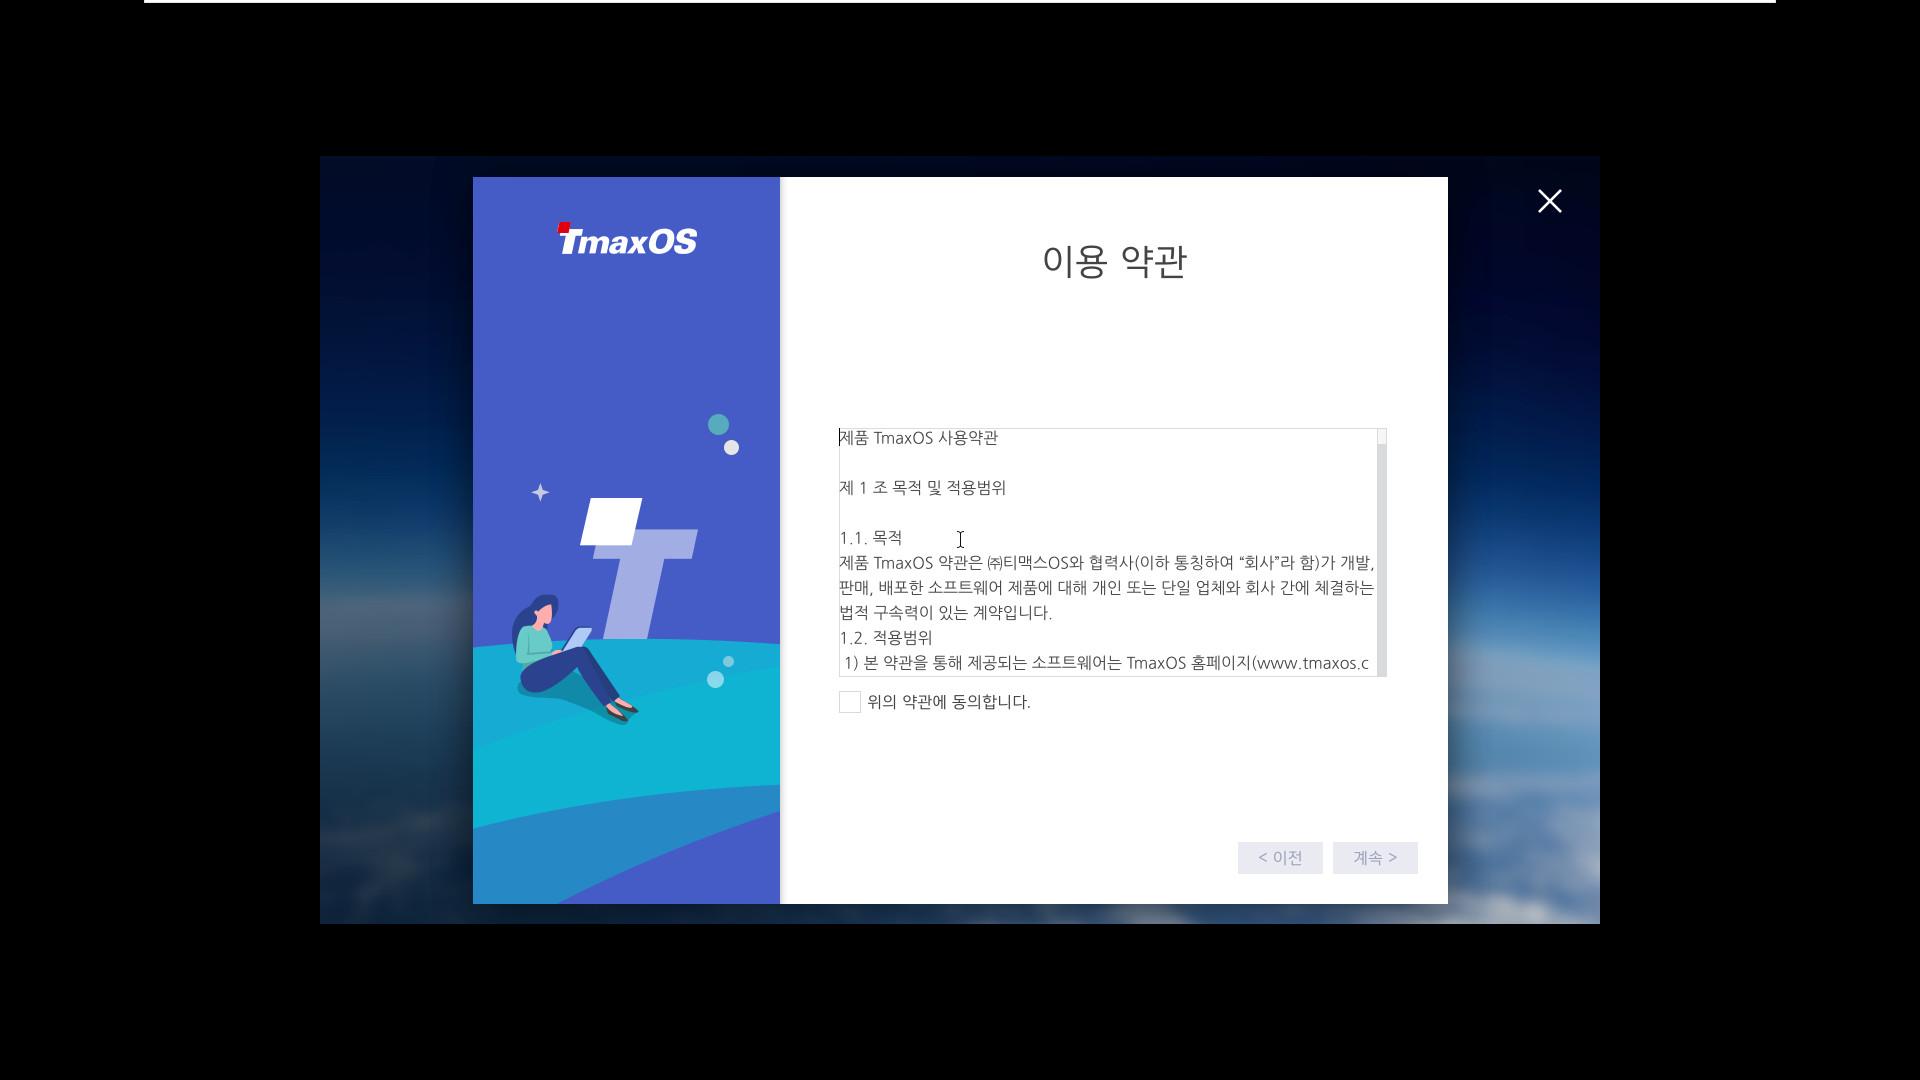 TmaxOS 설치 테스트 - 2번째 시도 - 이번에는 윈도에서 Tmax에서 제공한 T-Up TmaxOS.exe 으로 멀티 부팅으로 설치하기 2019-08-20_214602.jpg